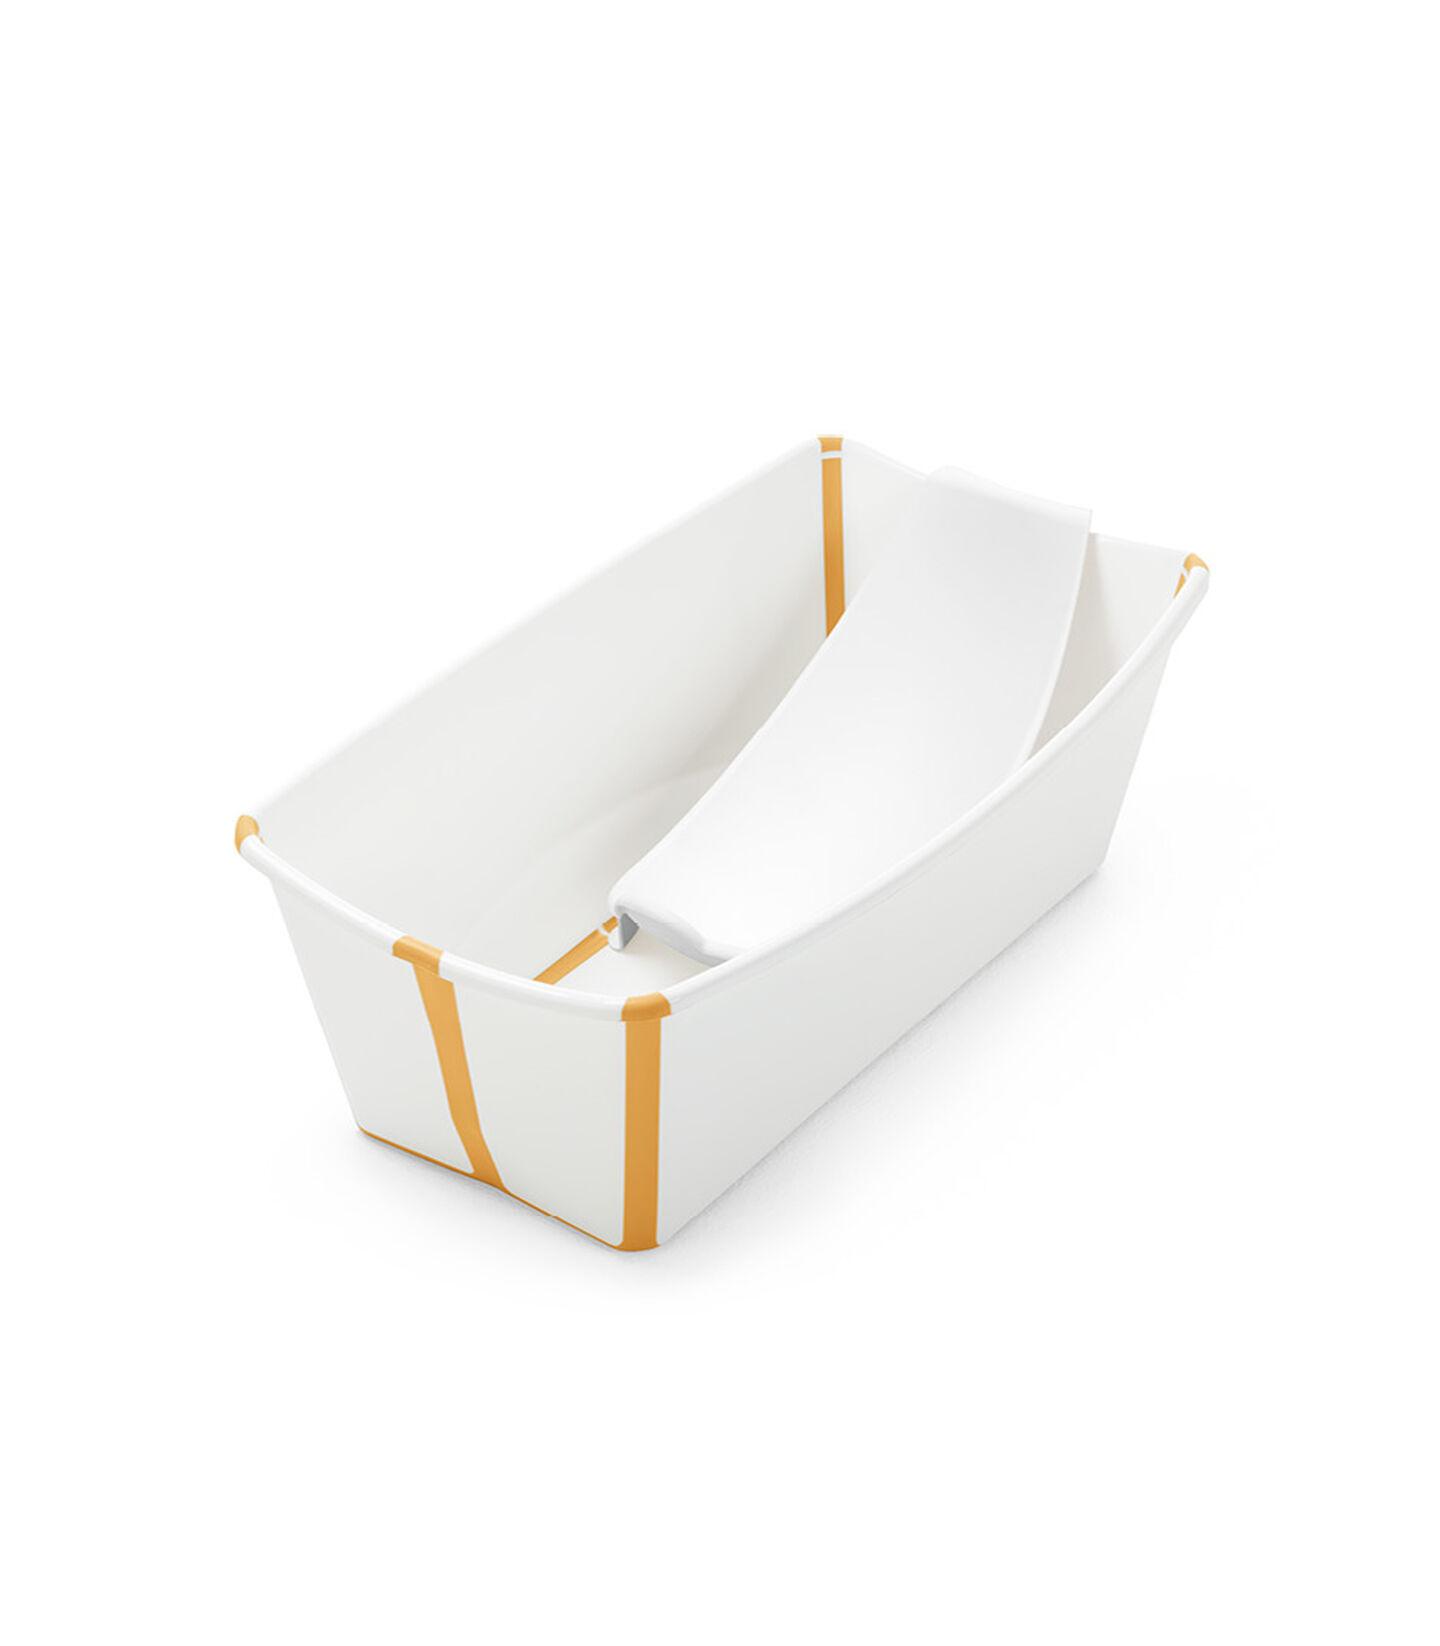 Stokke® Flexi Bath® Bundle White Yellow, White Yellow, mainview view 1